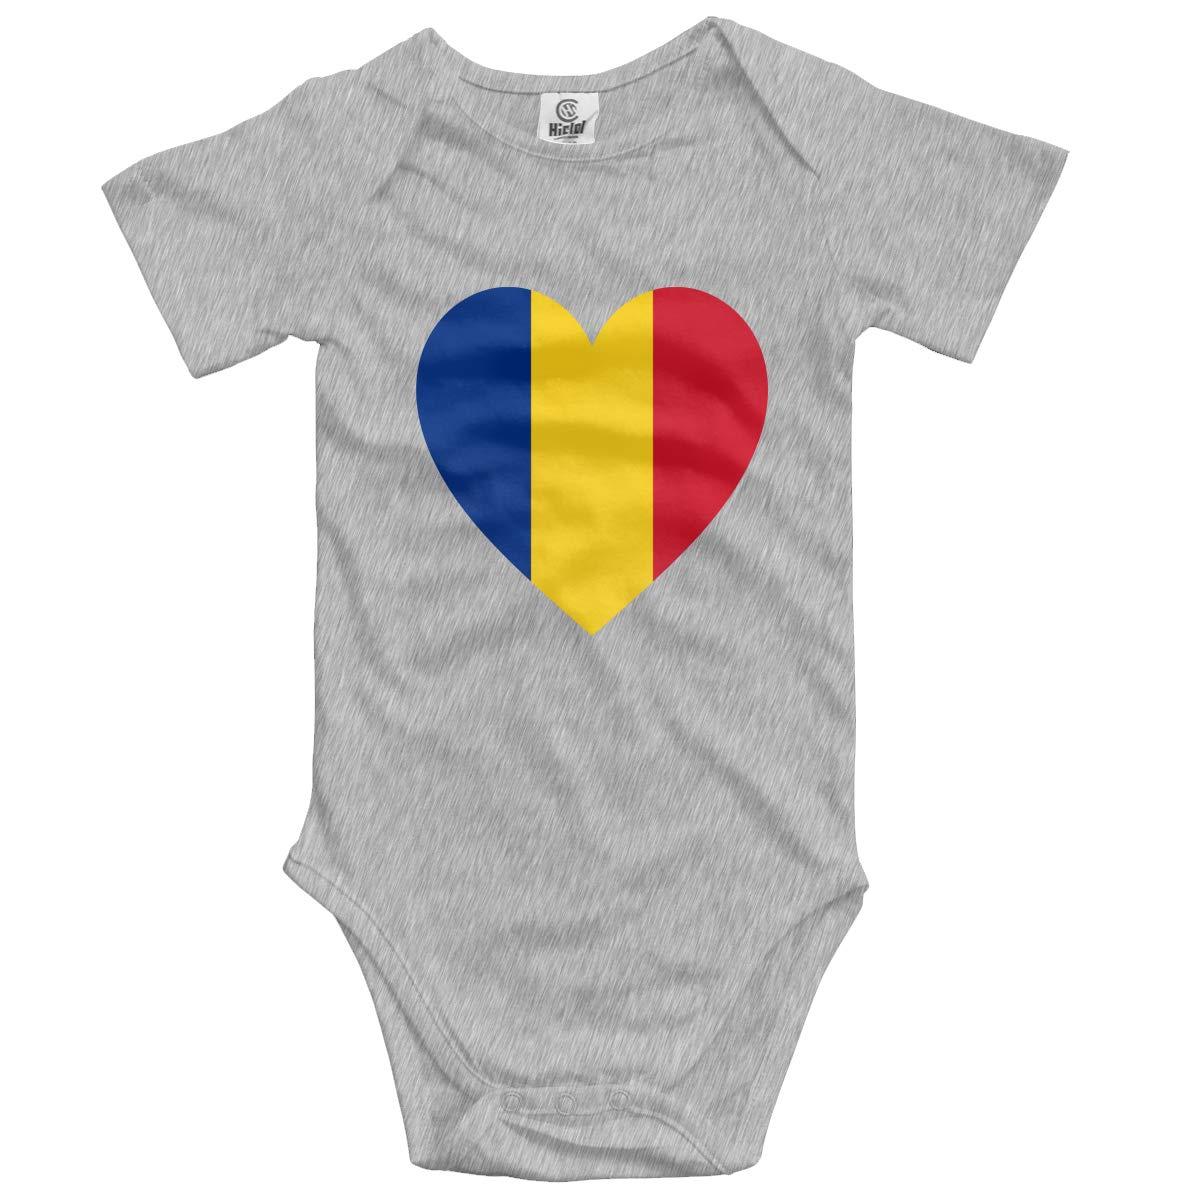 Baby Short-Sleeve Onesies Love Romania Flag Bodysuit Baby Outfits